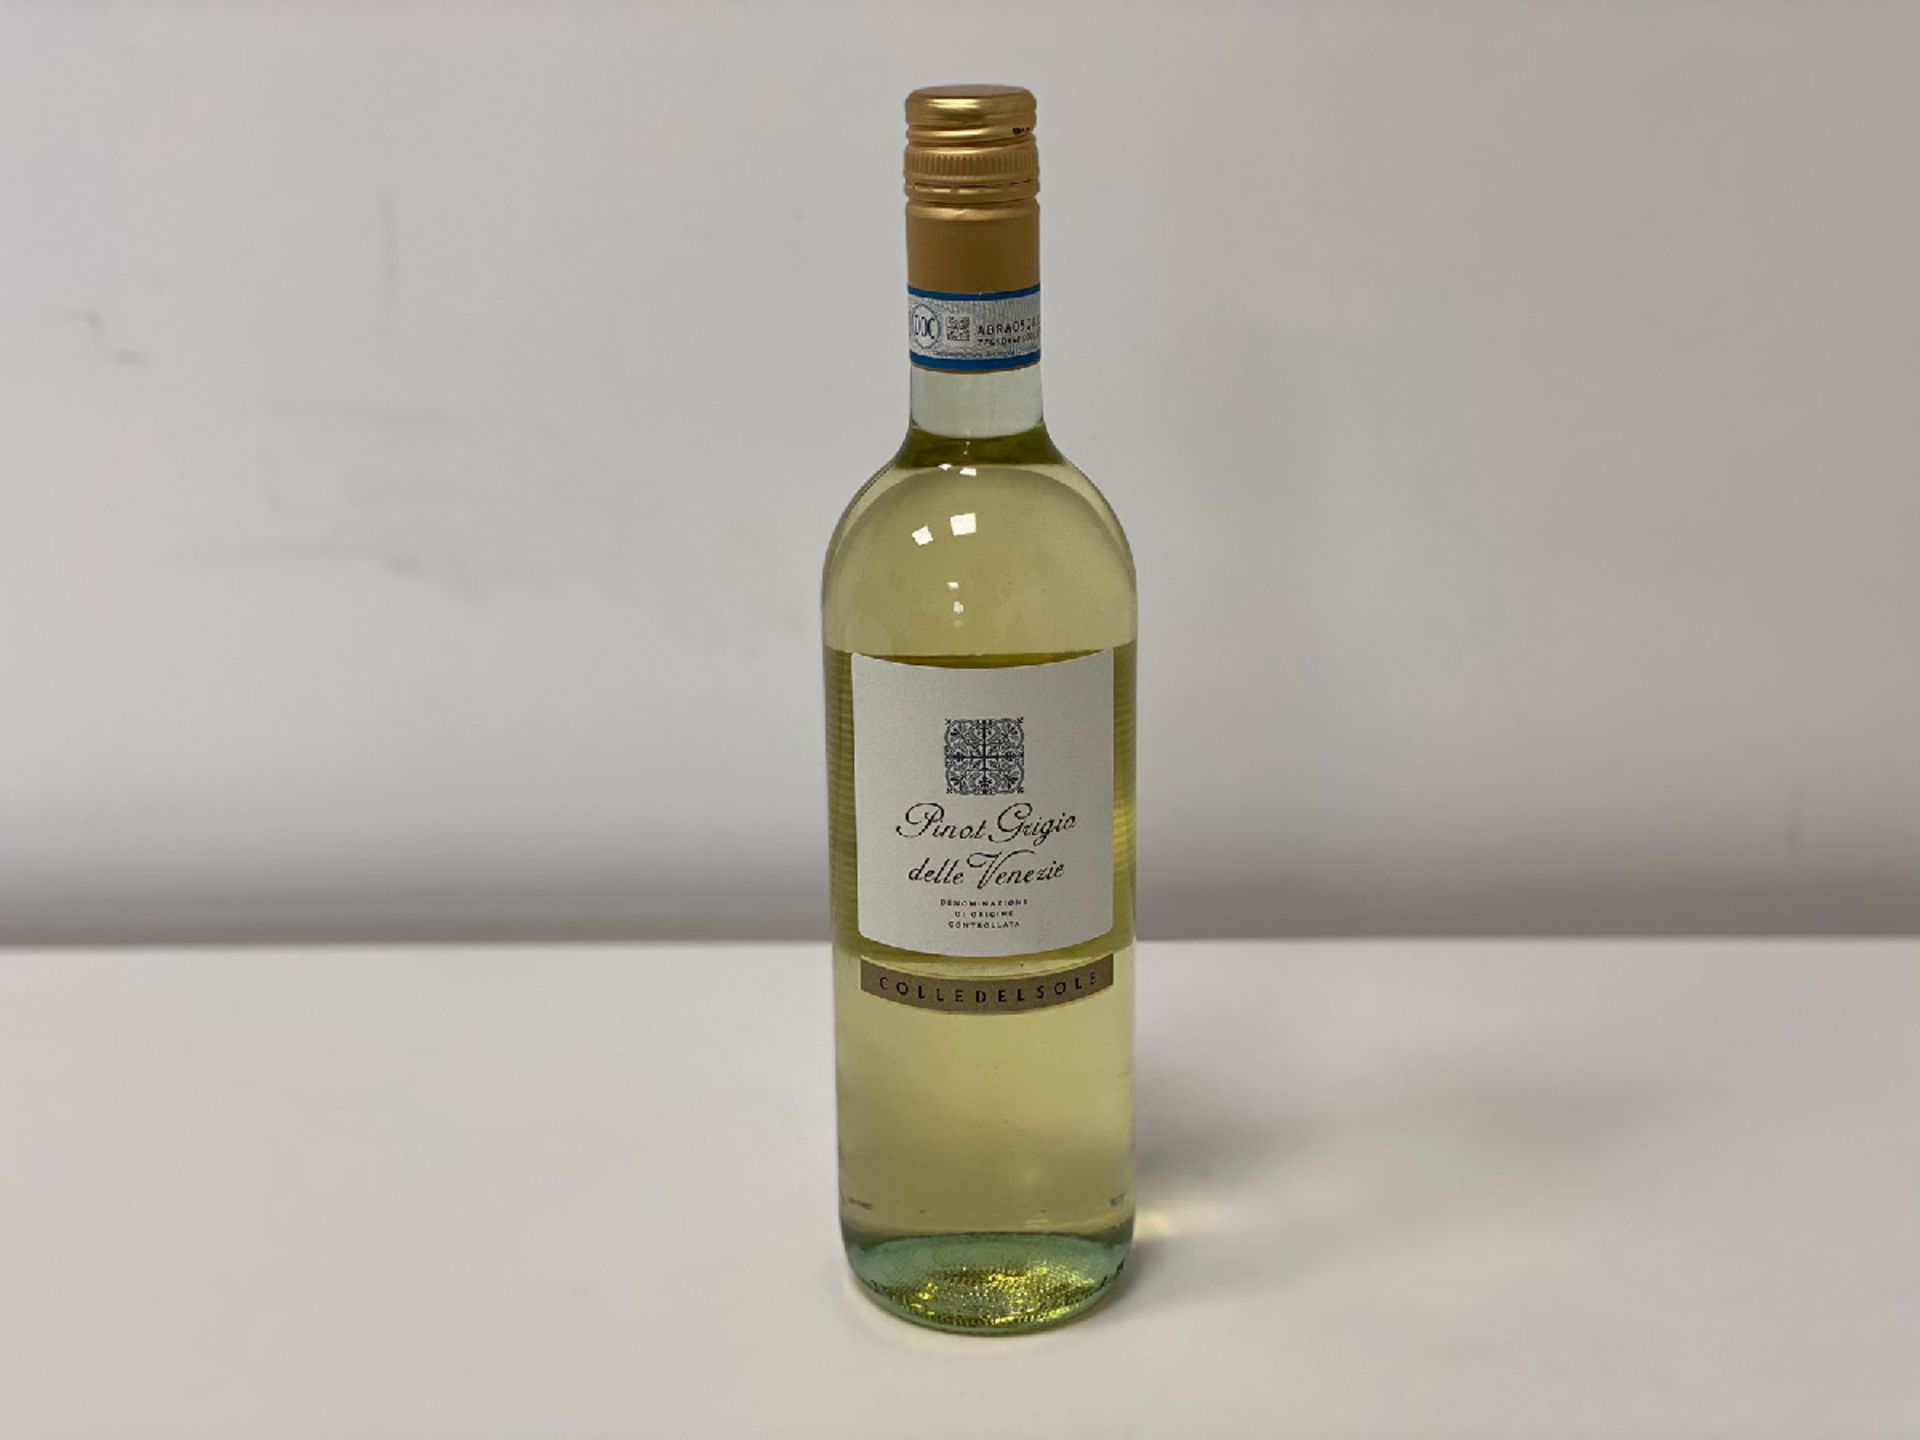 6 Bottles (1 Case) of Natale Verga - Pinot Grigio - Colle del Sole - Venezie DOC - Natale Verga - V